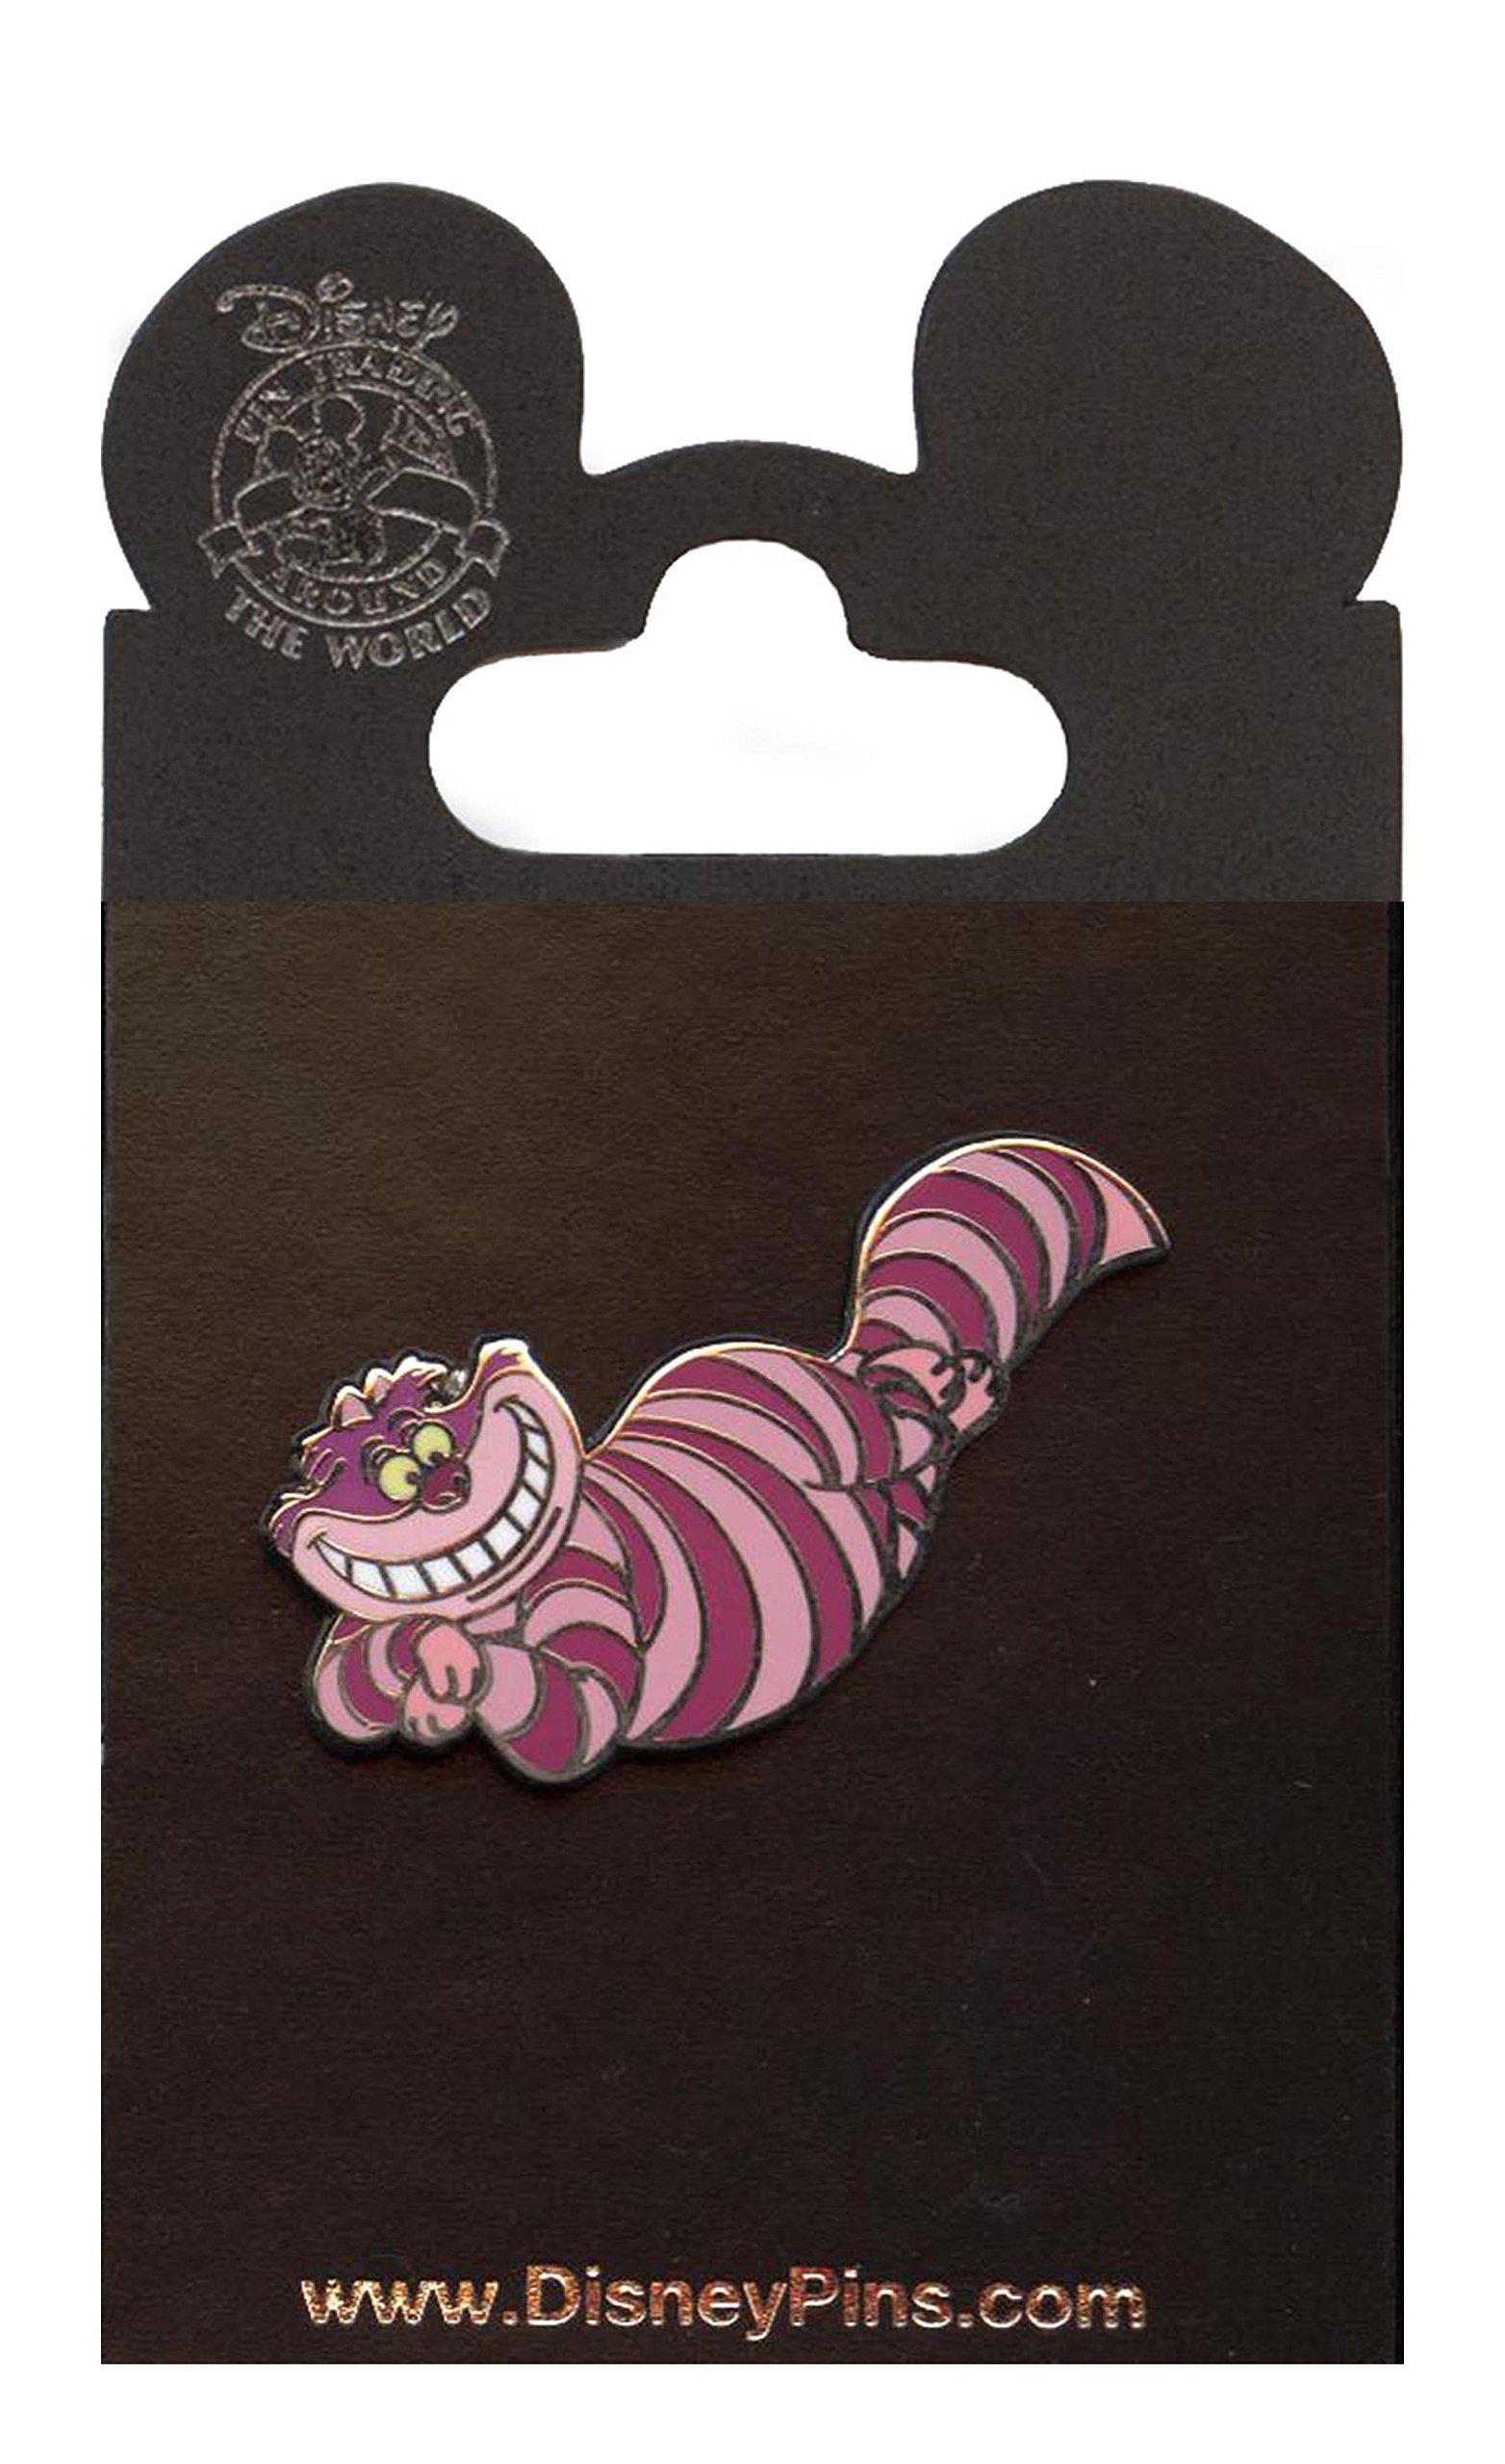 Disney Trading Pins - Walt Disney's Alice in Wonderland - Cheshire Cat